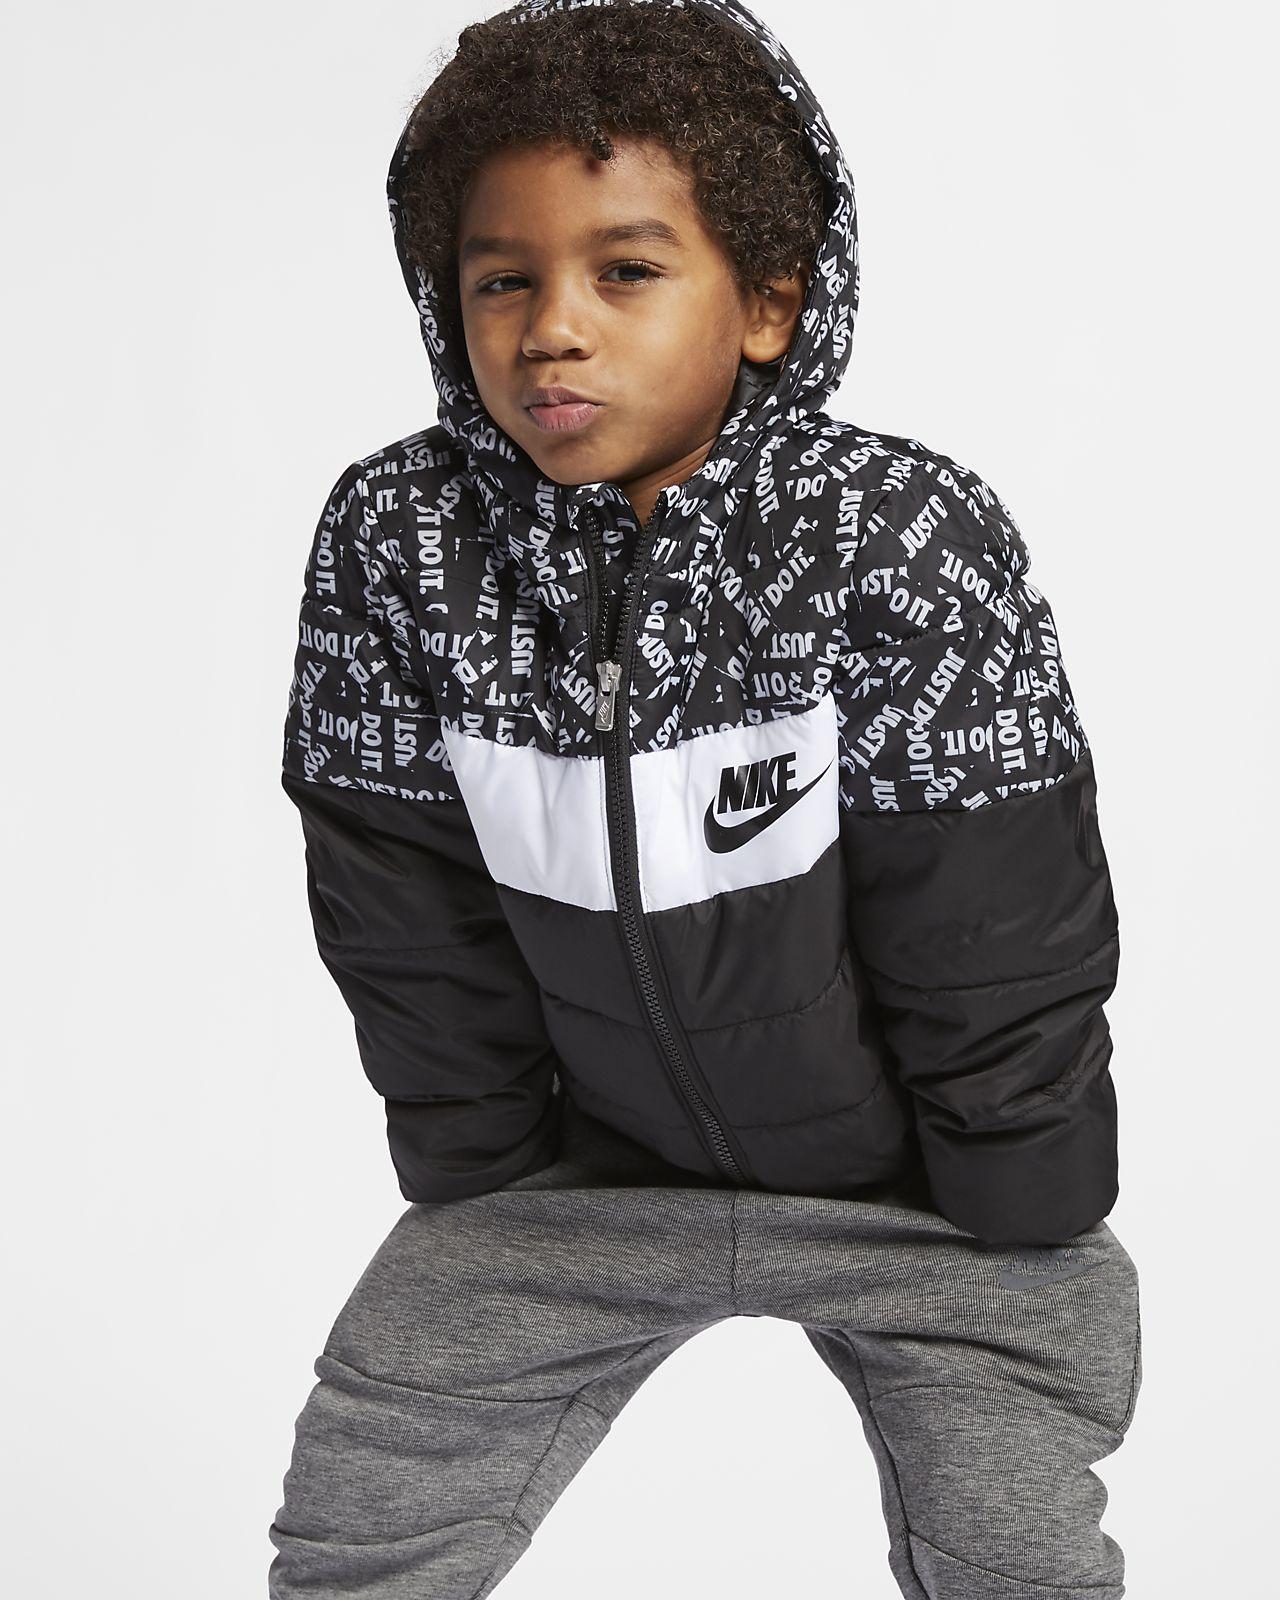 d351fd42c Nike Sportswear Toddler Puffer Jacket. Nike.com